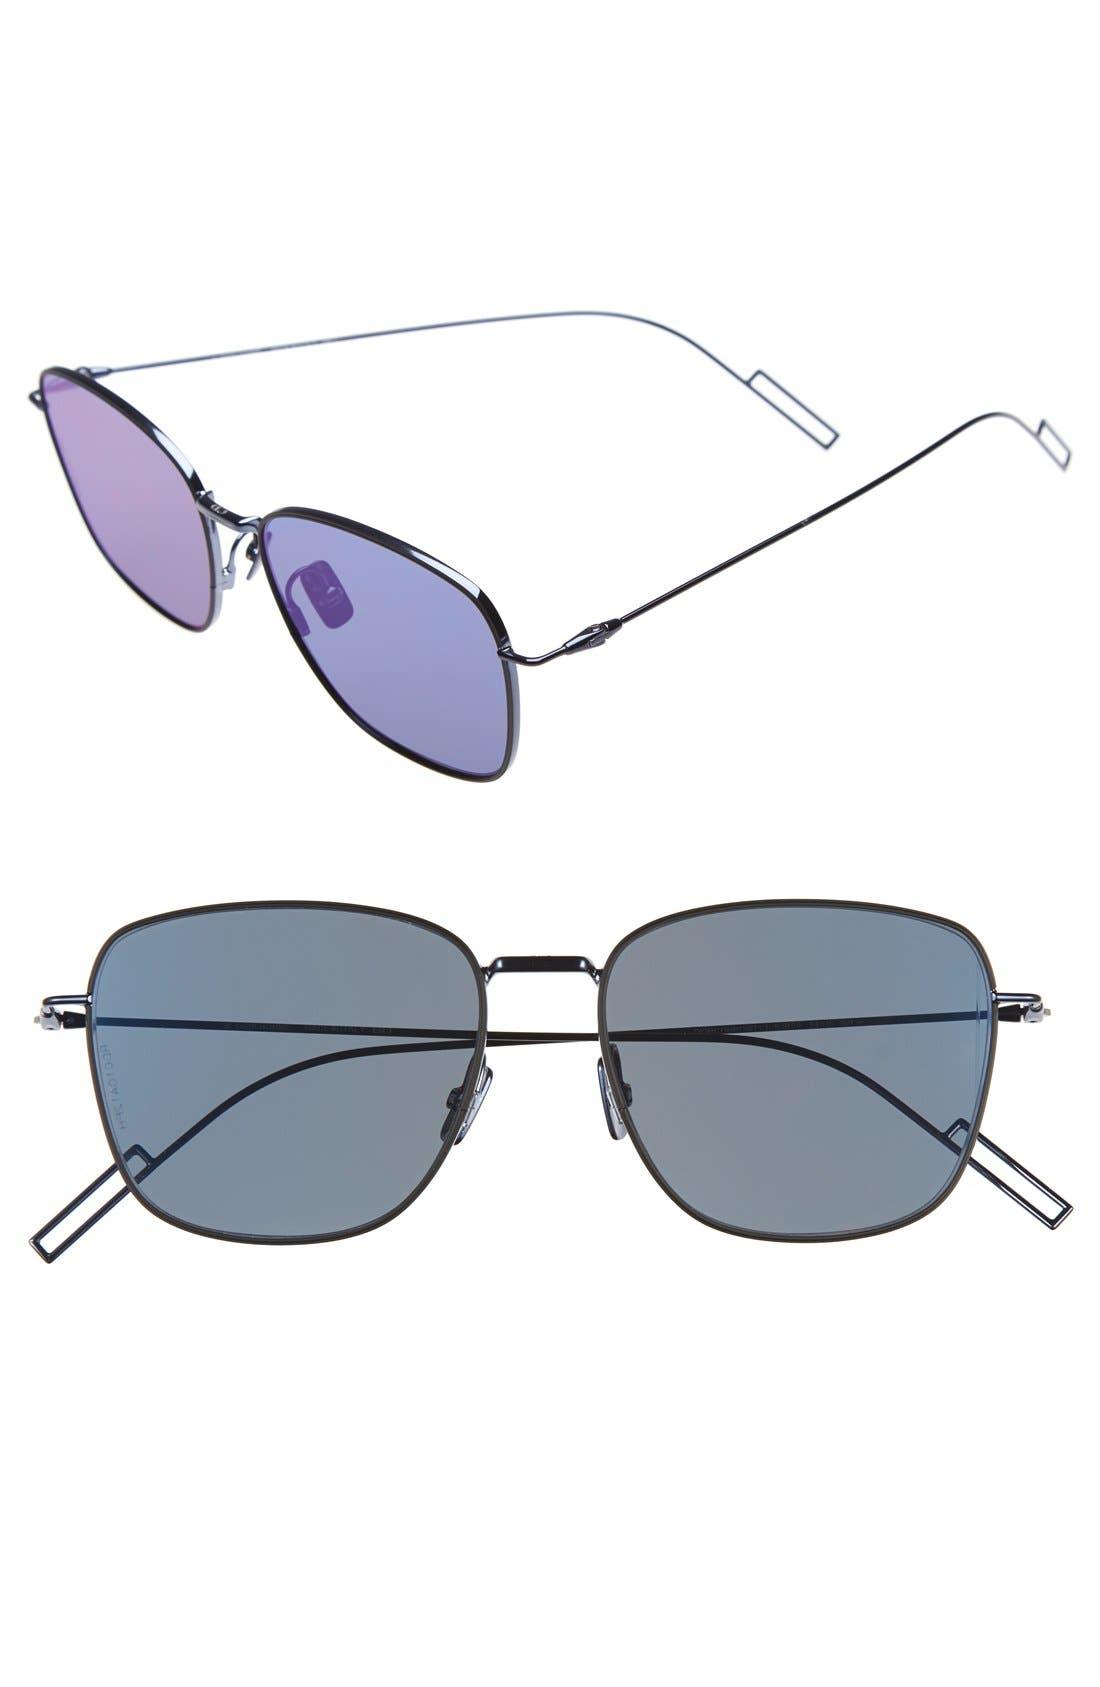 'Composit 1.1S' 54mm Metal Sunglasses,                             Main thumbnail 1, color,                             Blue Palladium/ Blue Mirror